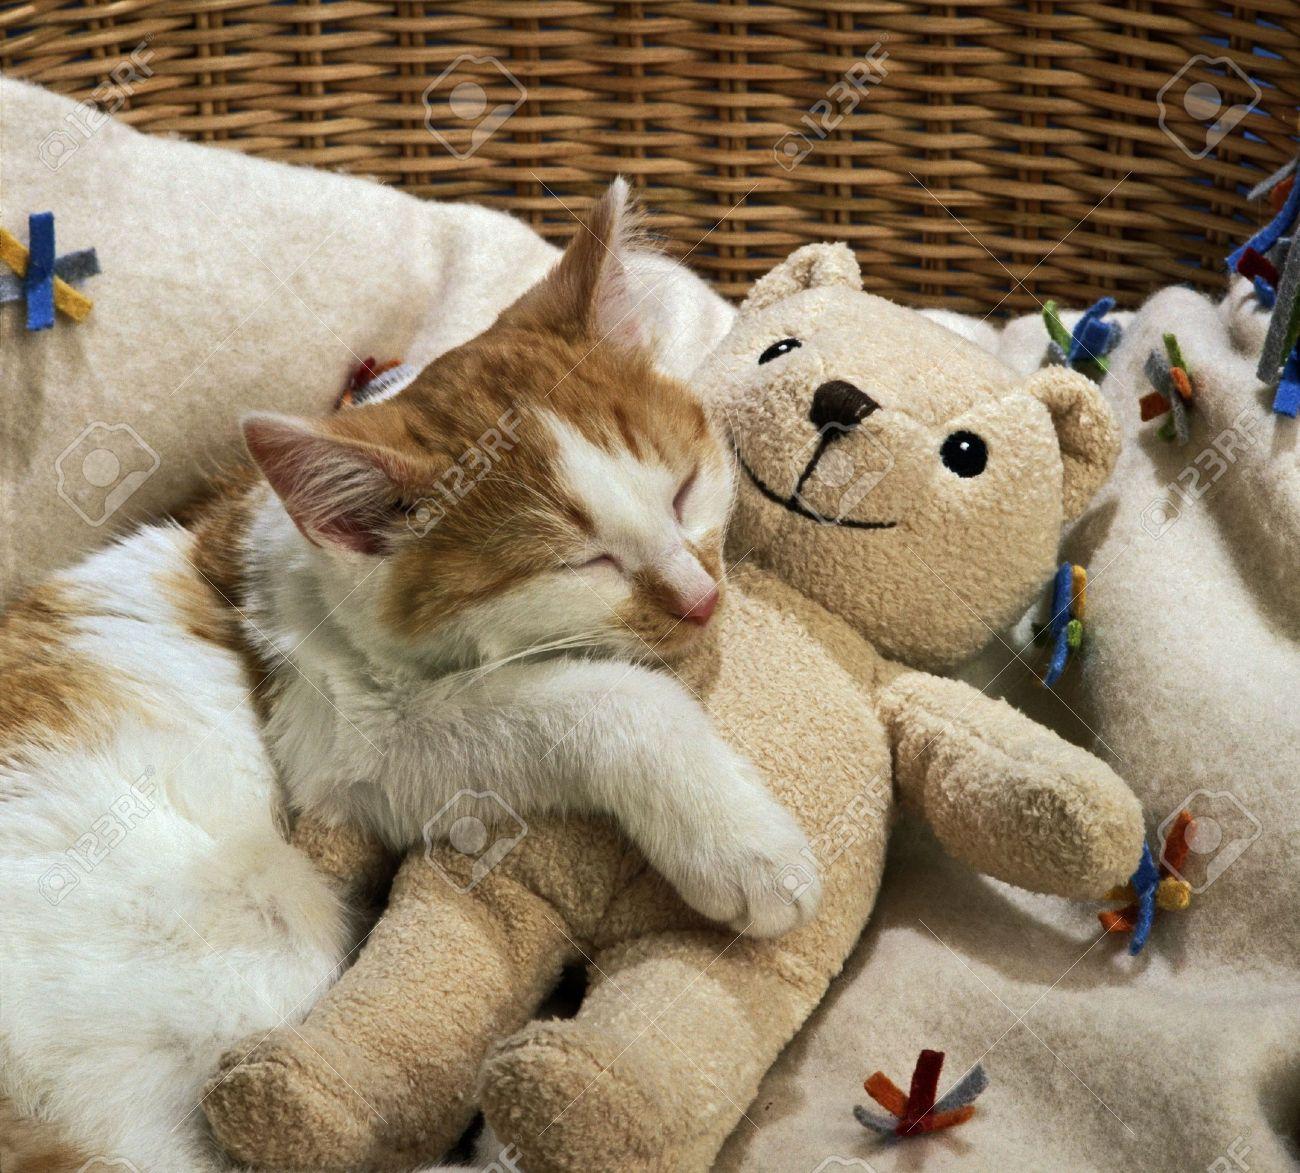 cat sleeping with teddy bear - 3662197